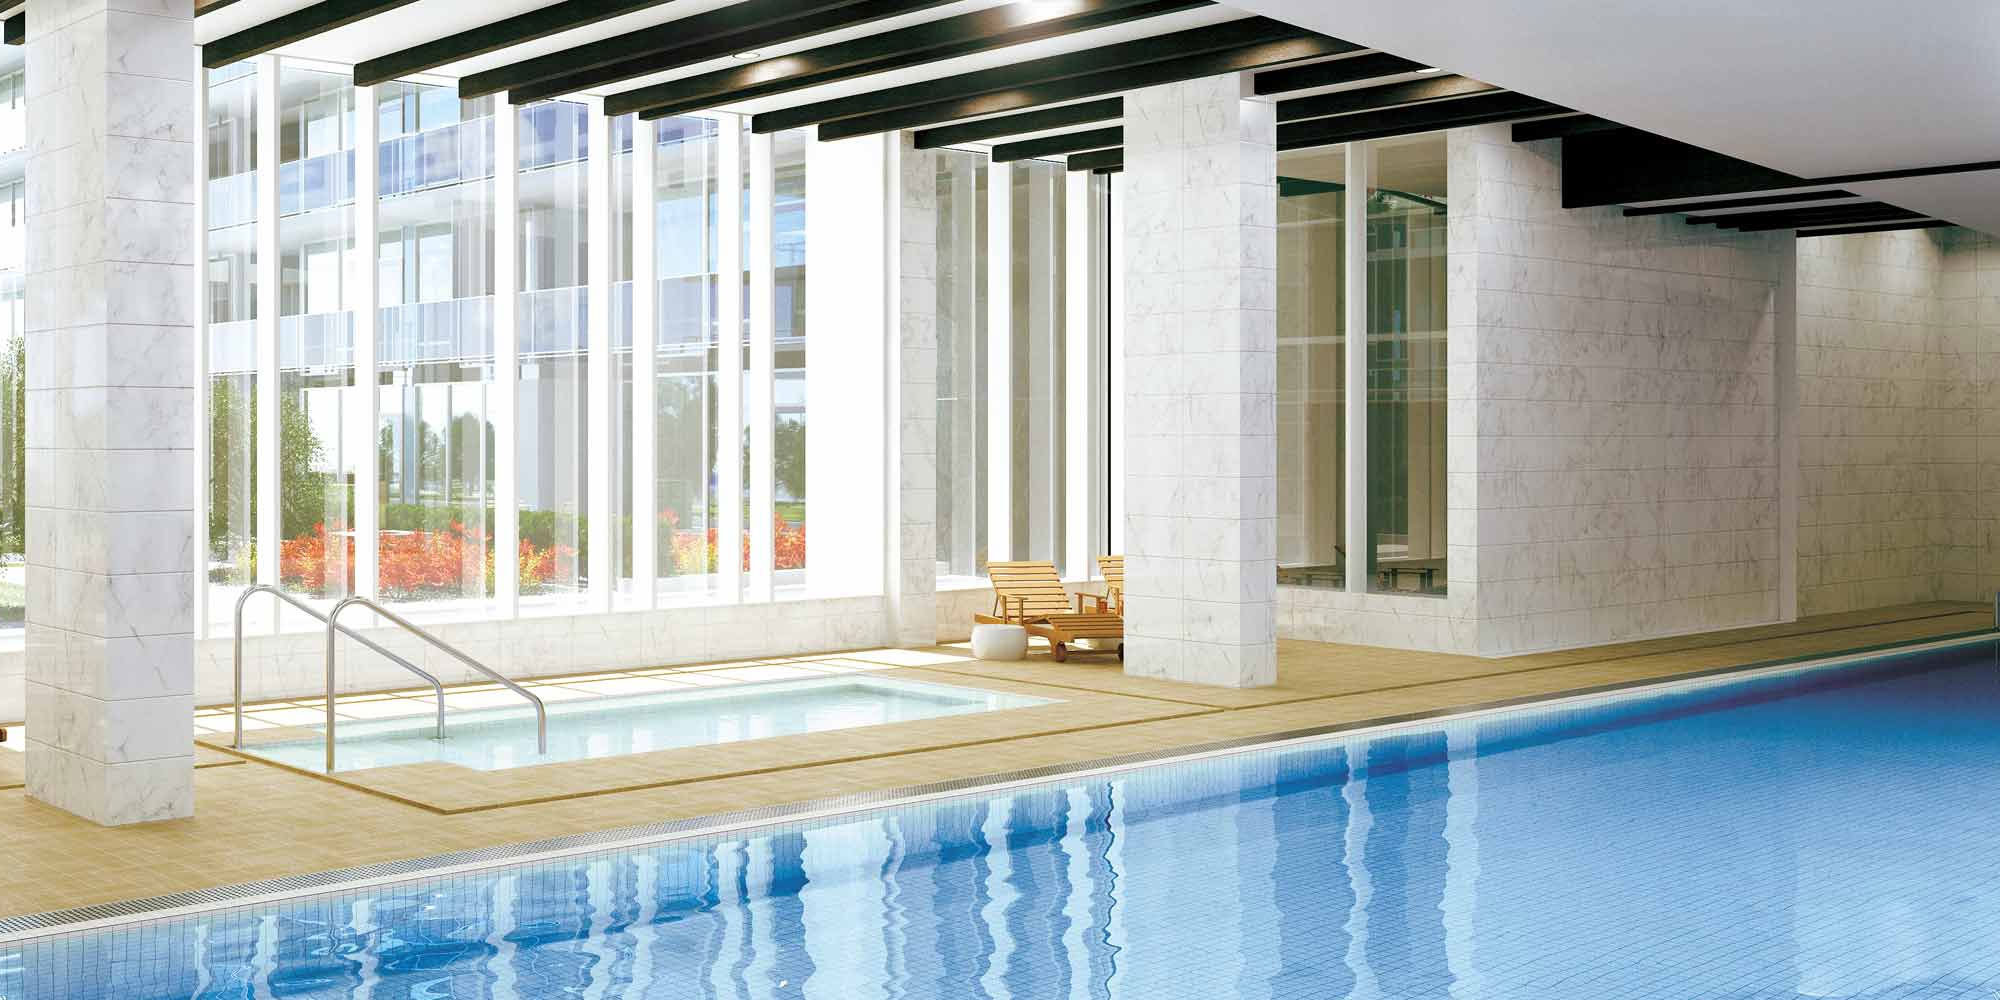 Rendering of Swimming Pool!